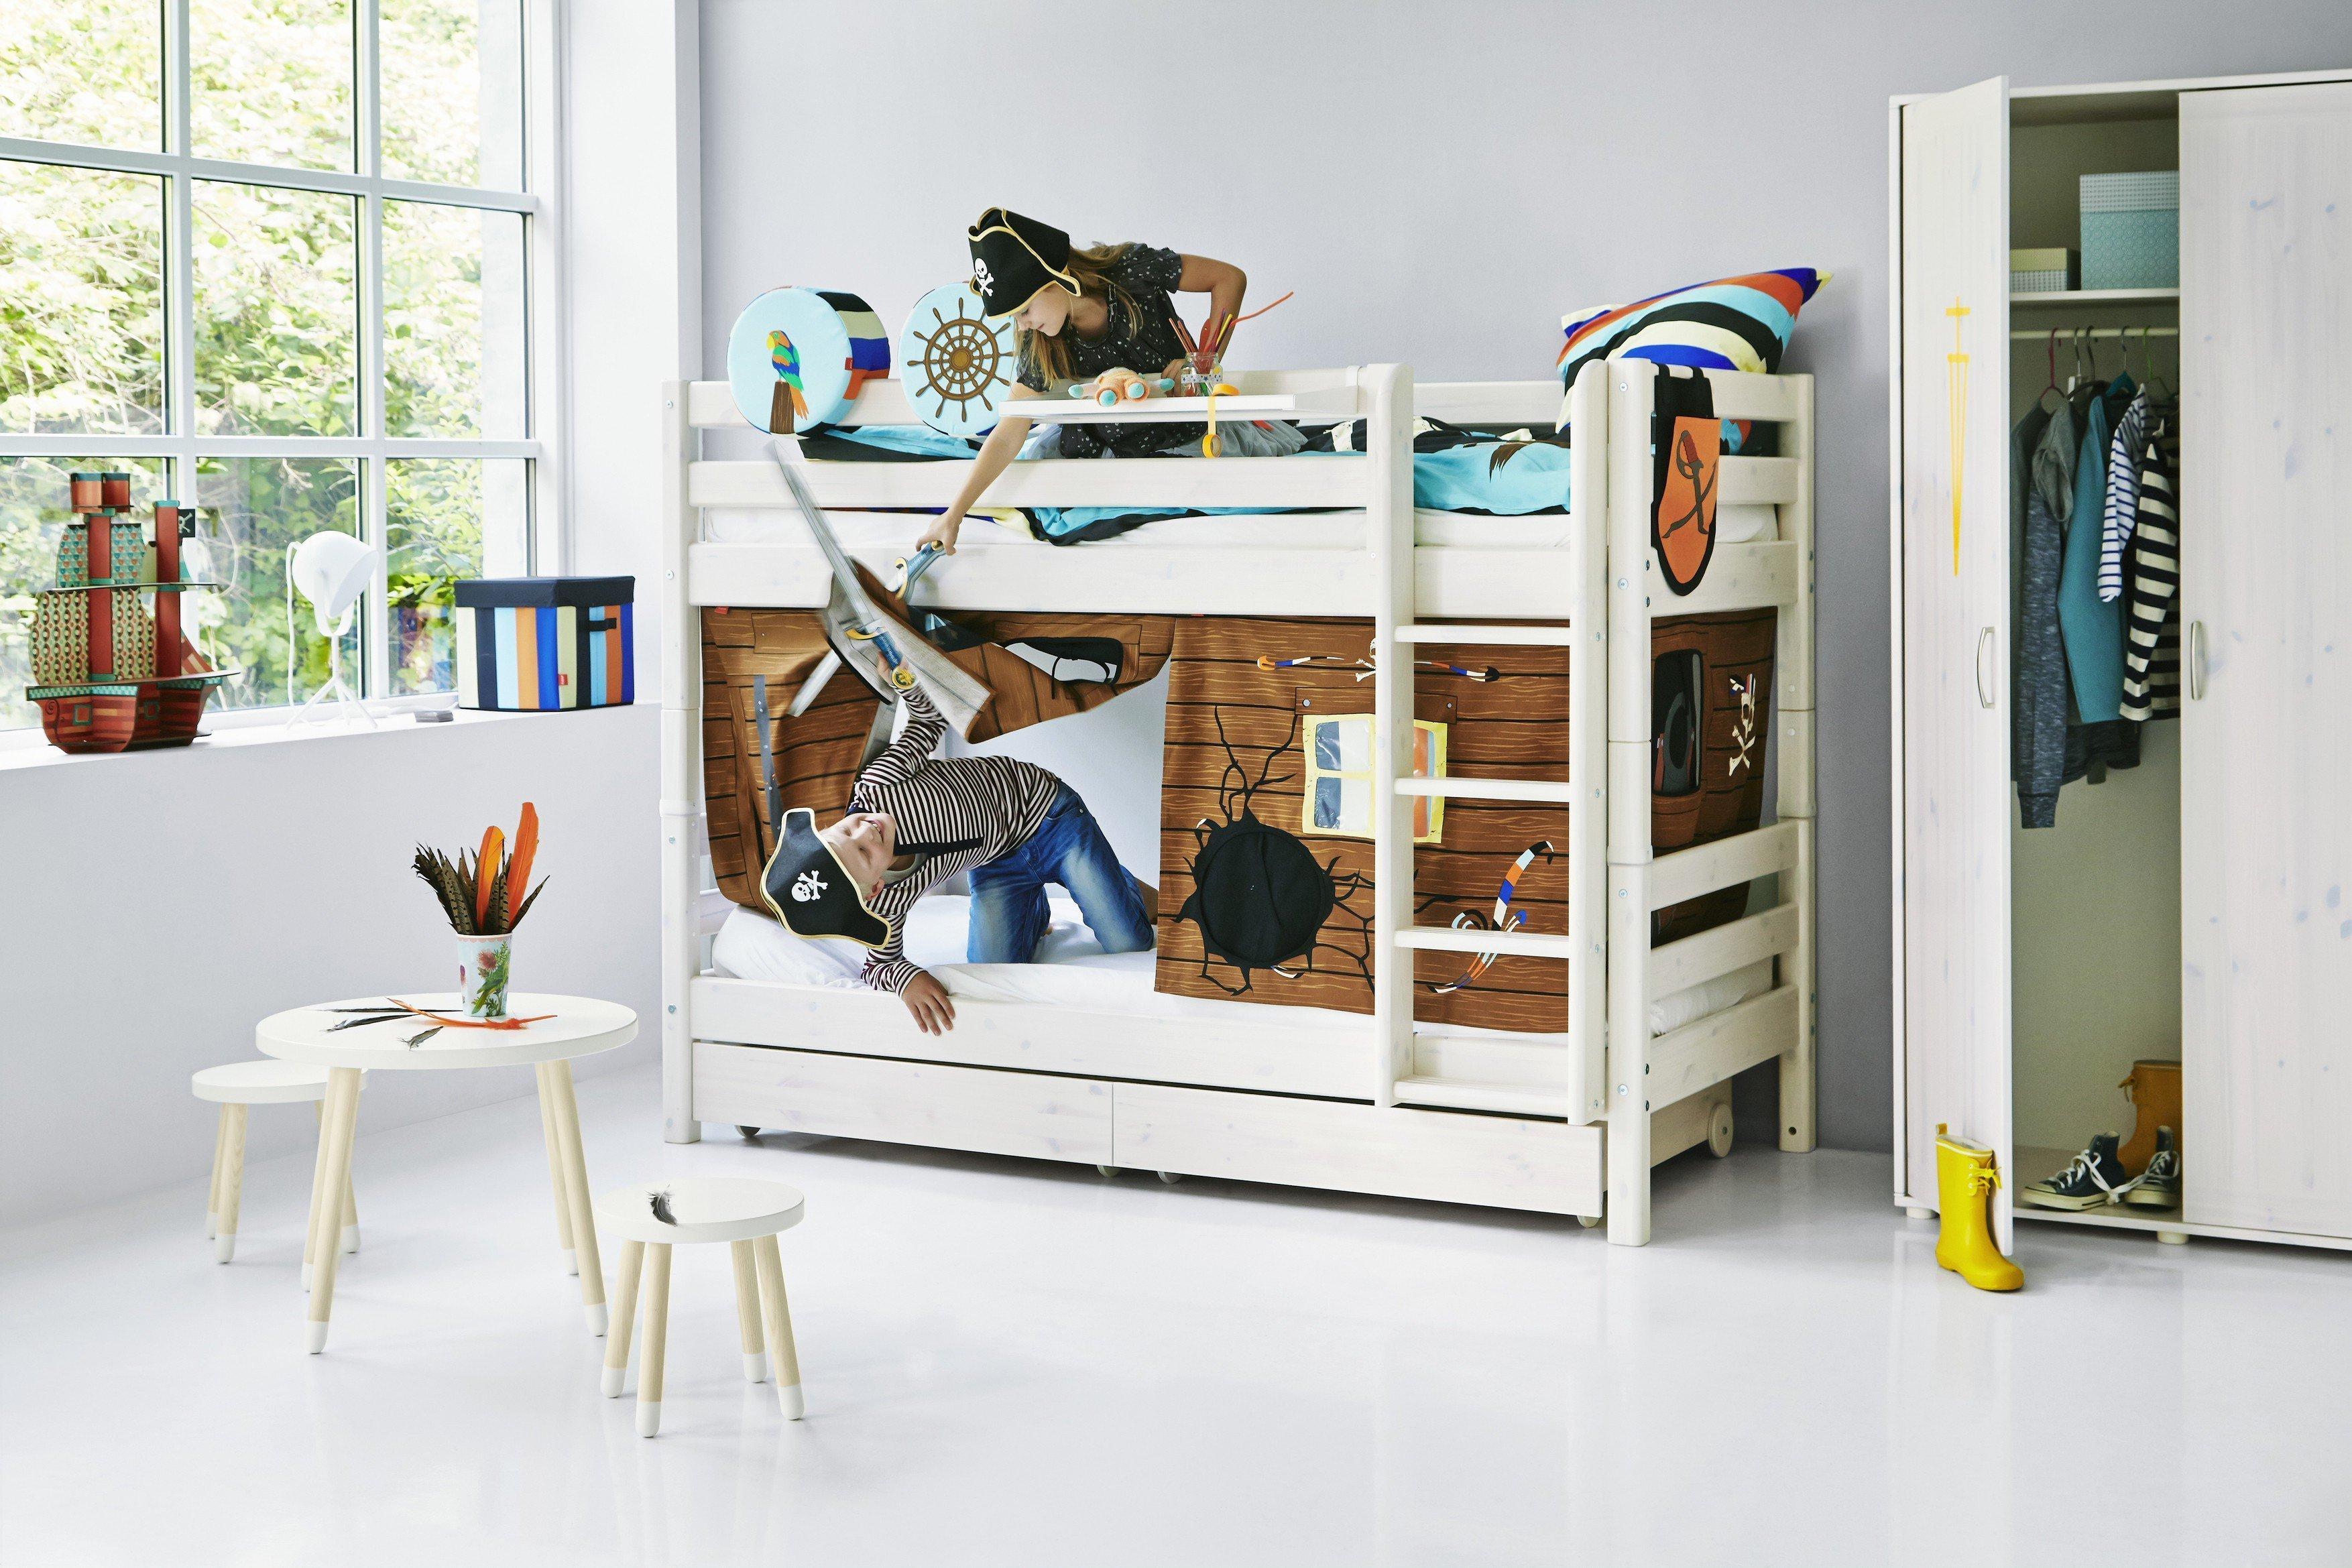 FLEXA Classic Etagenbett Kiefer massiv | Möbel Letz - Ihr Online-Shop